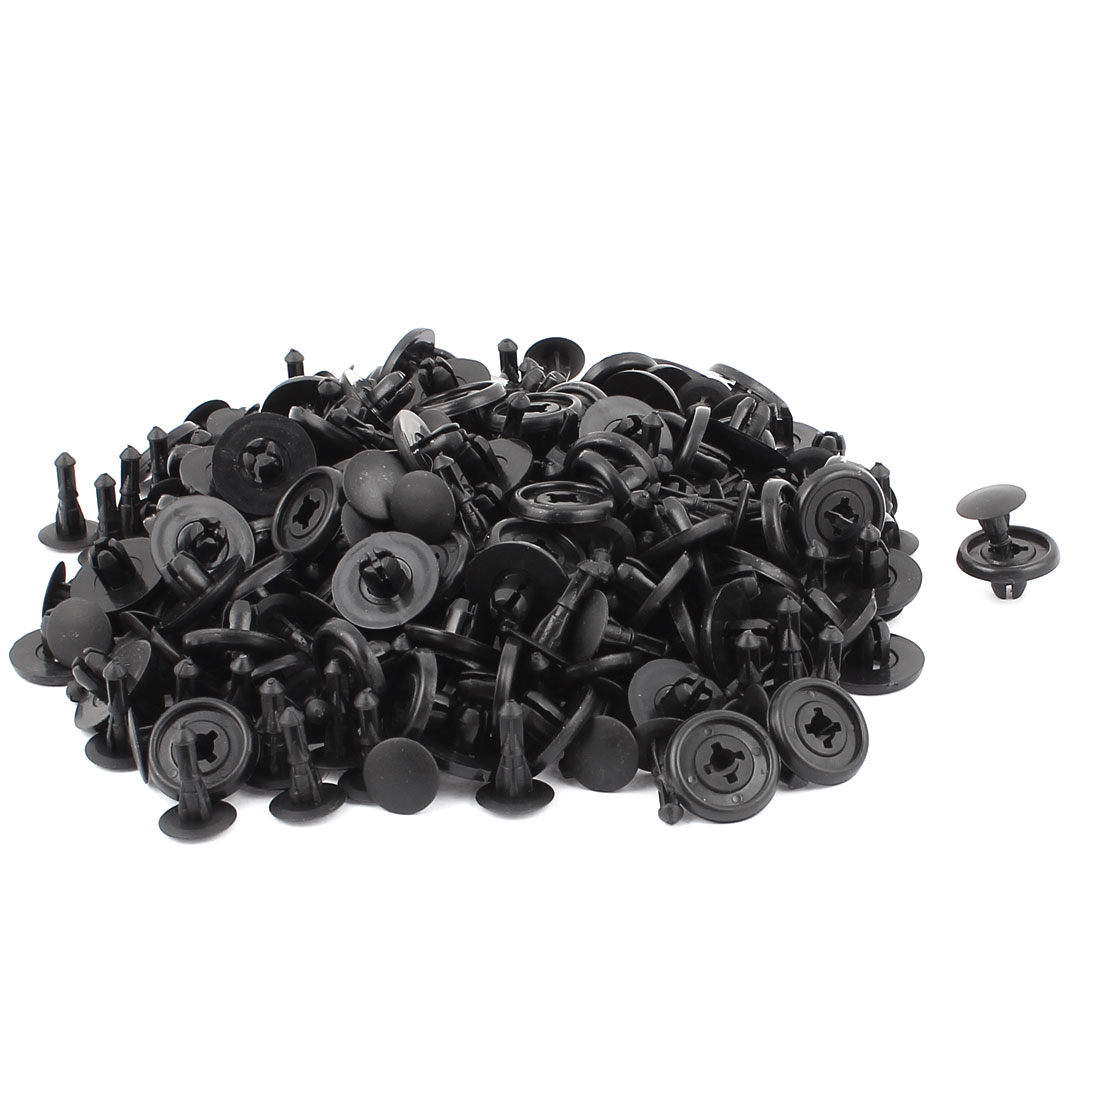 130pcs Black Plastic Rivets Fastener Push-Type Bumper Retainer Car Truck Door Trim Panel Clips